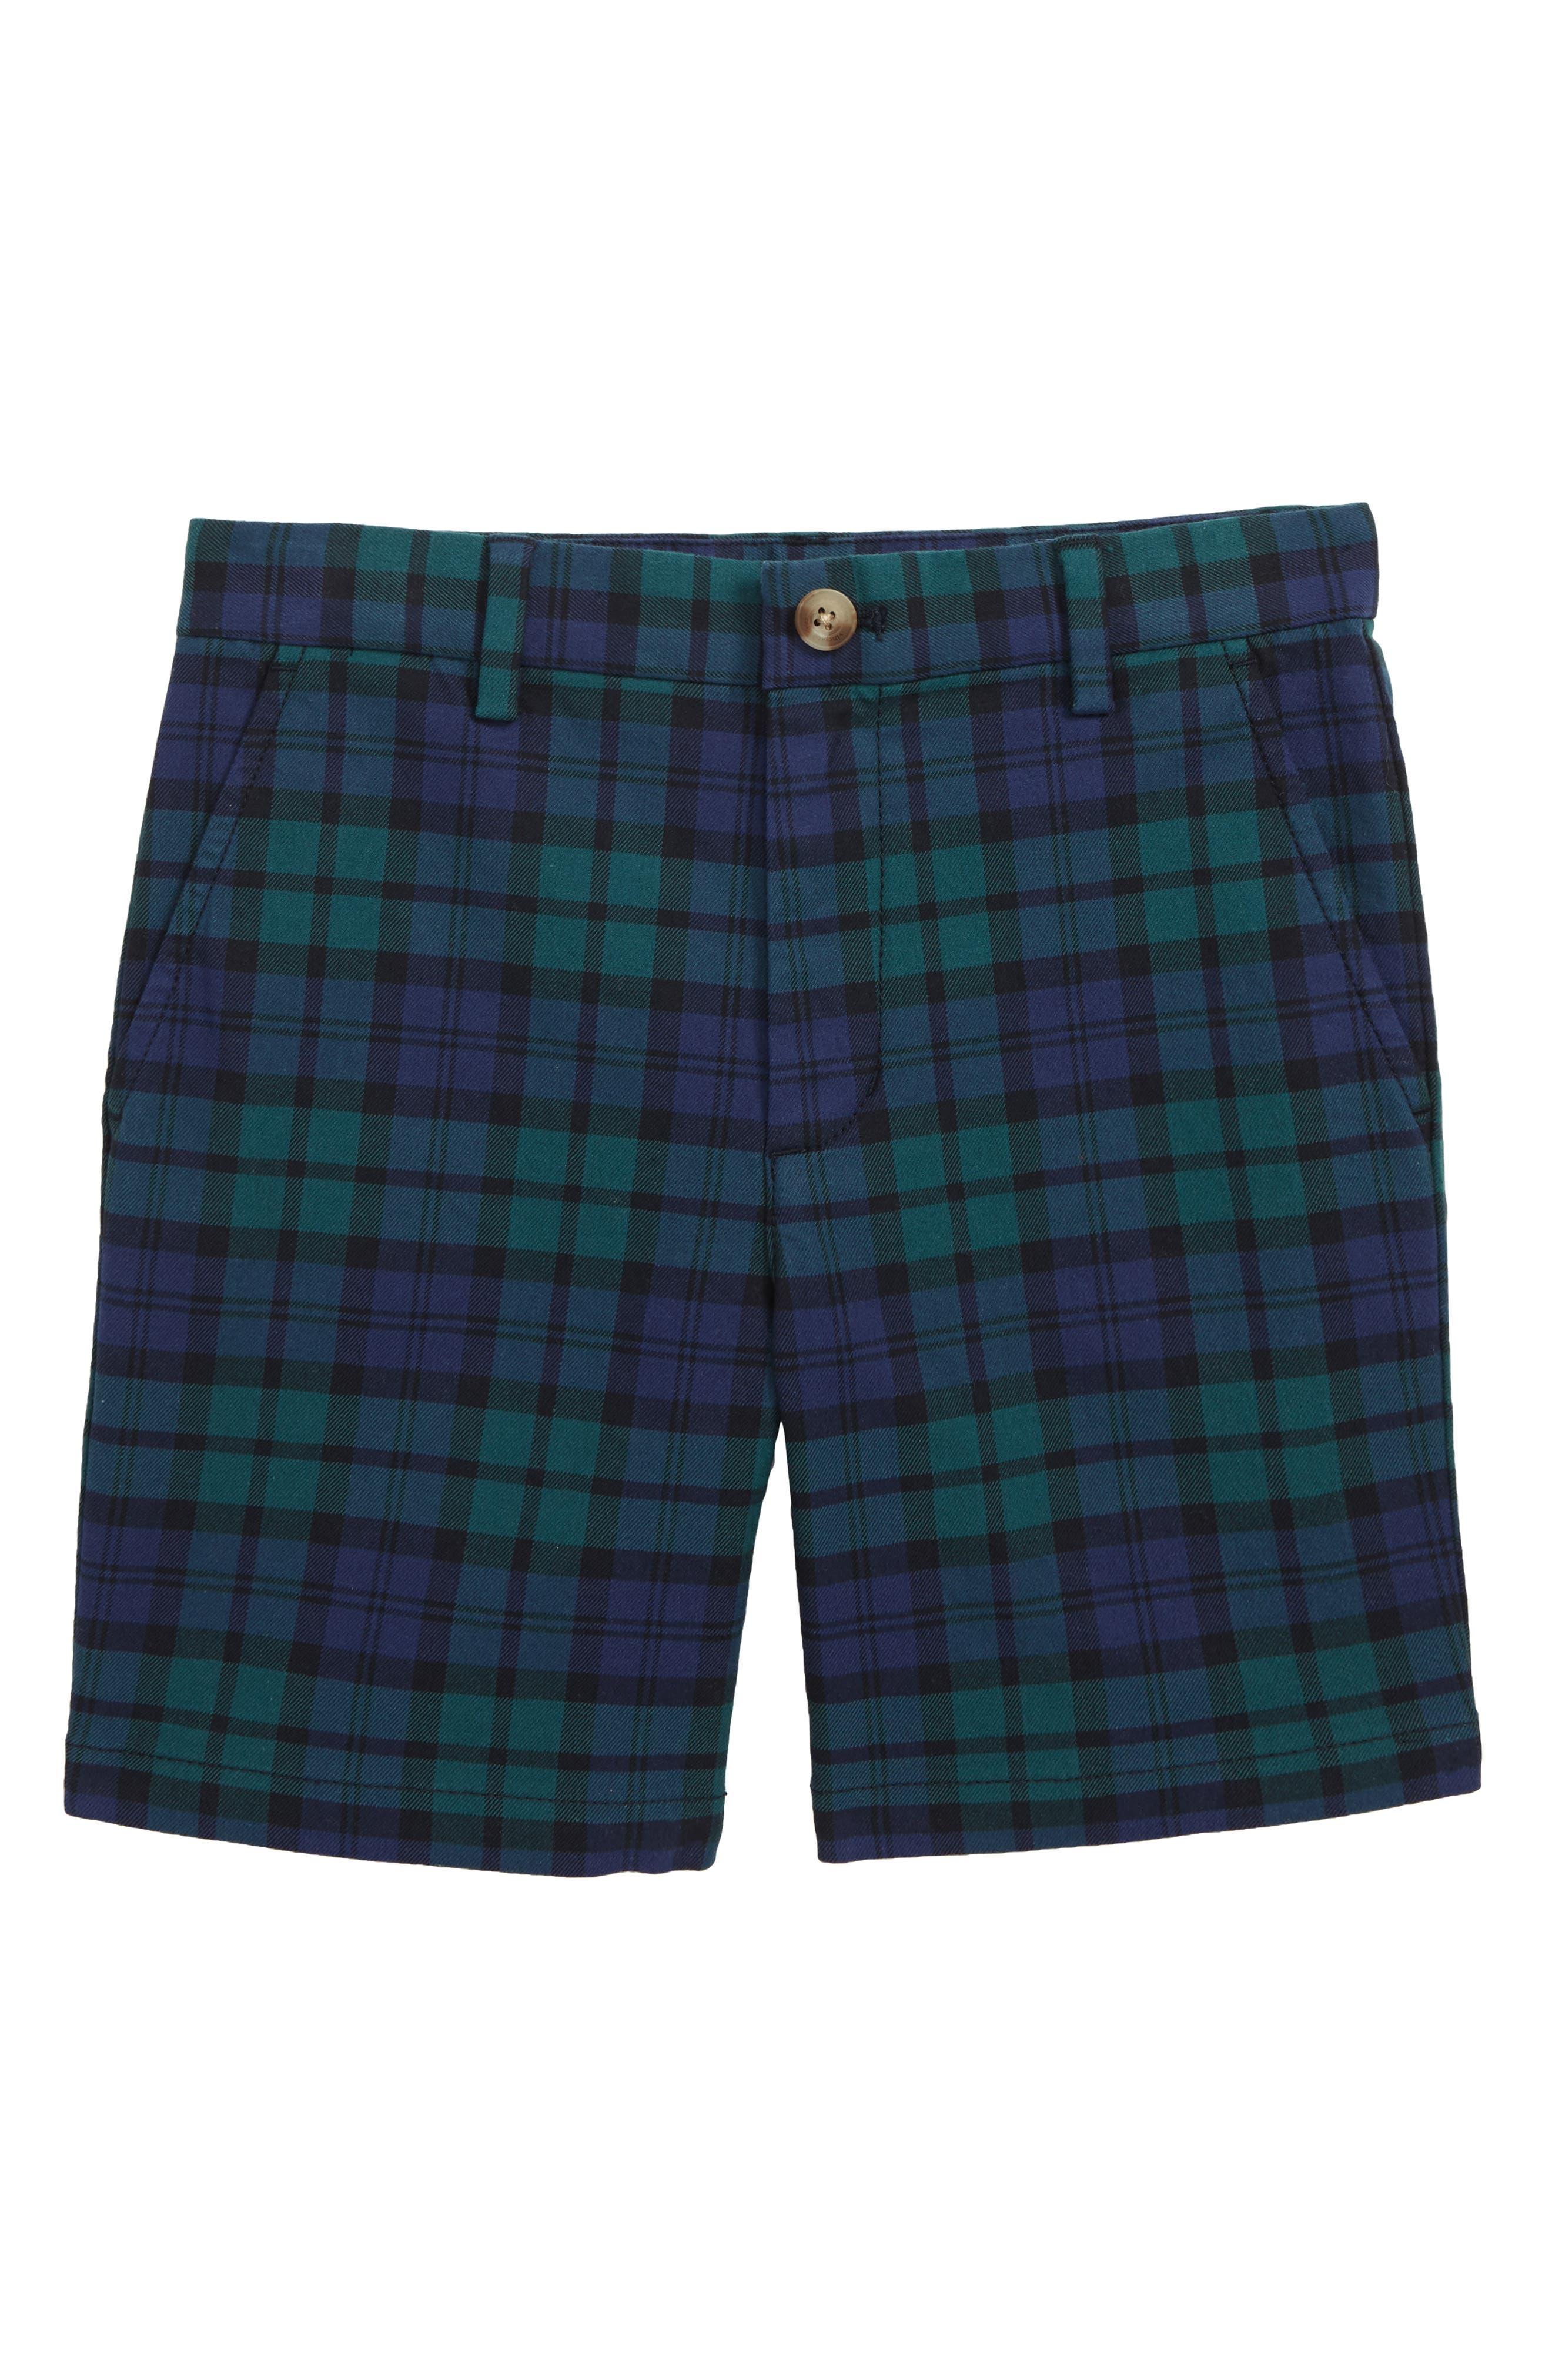 Blackwatch Breaker Shorts,                         Main,                         color, DEEP BAY